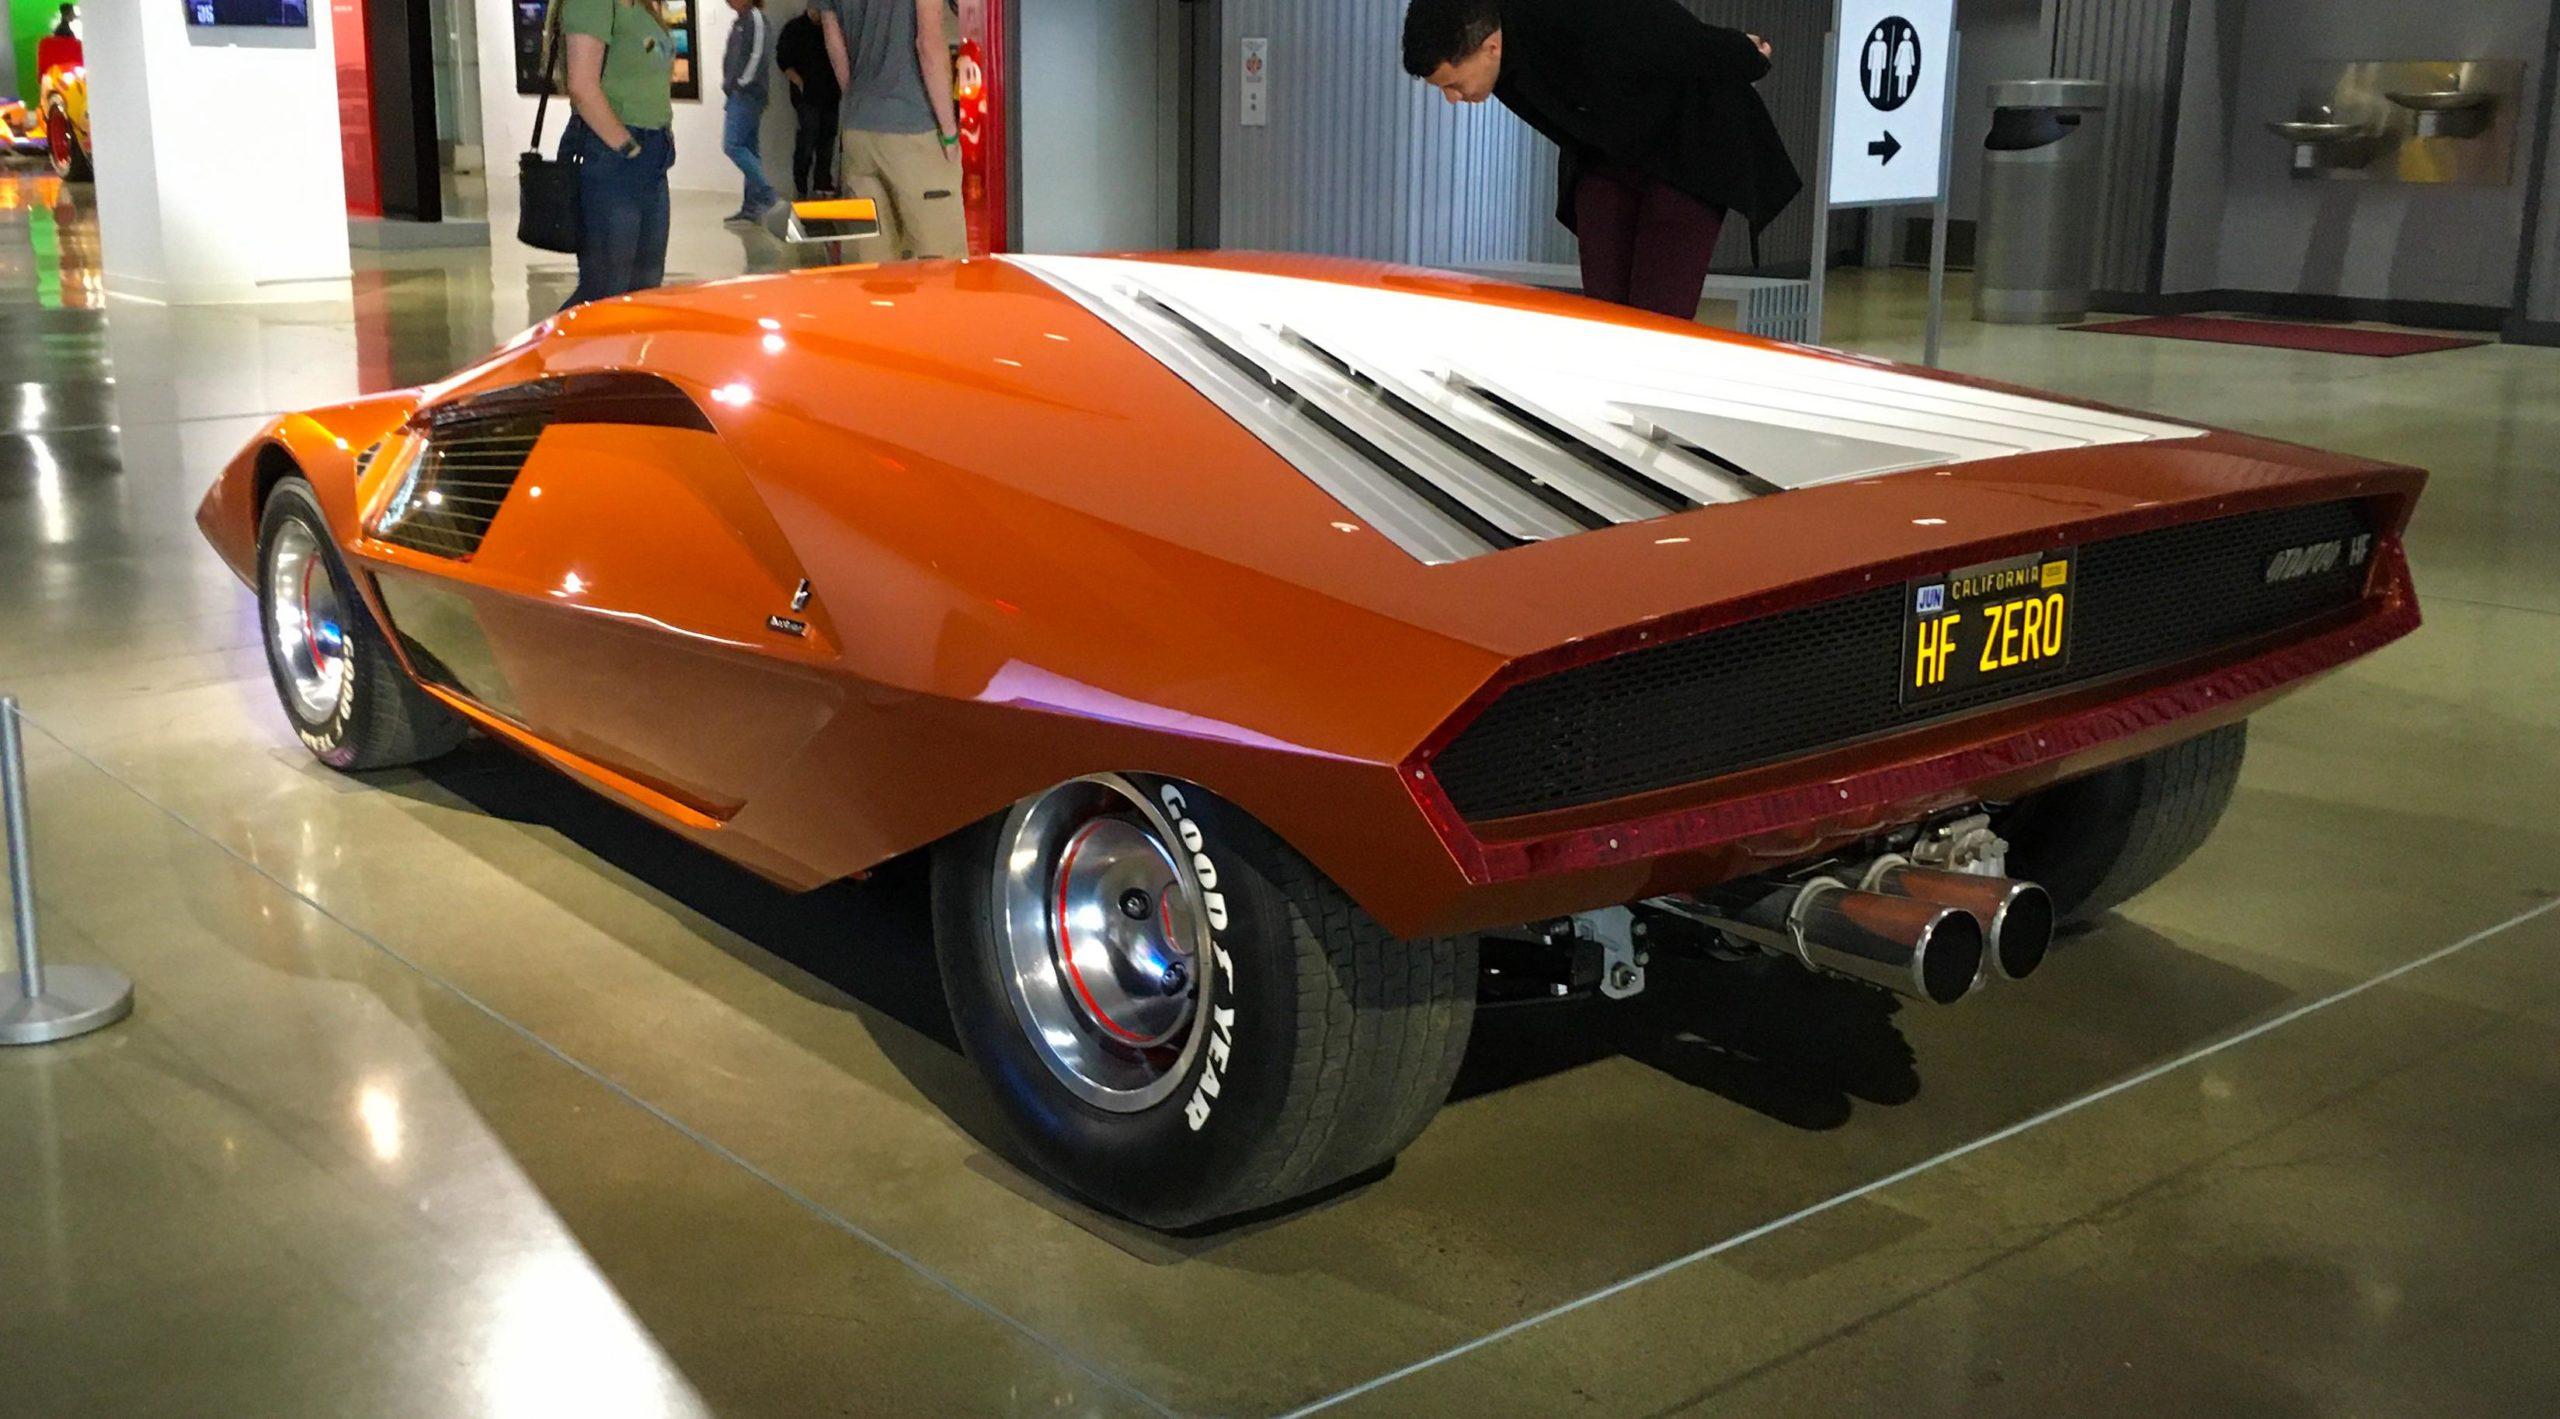 Lancia Stratos HF Zero Concept, Petersen Auto Museum